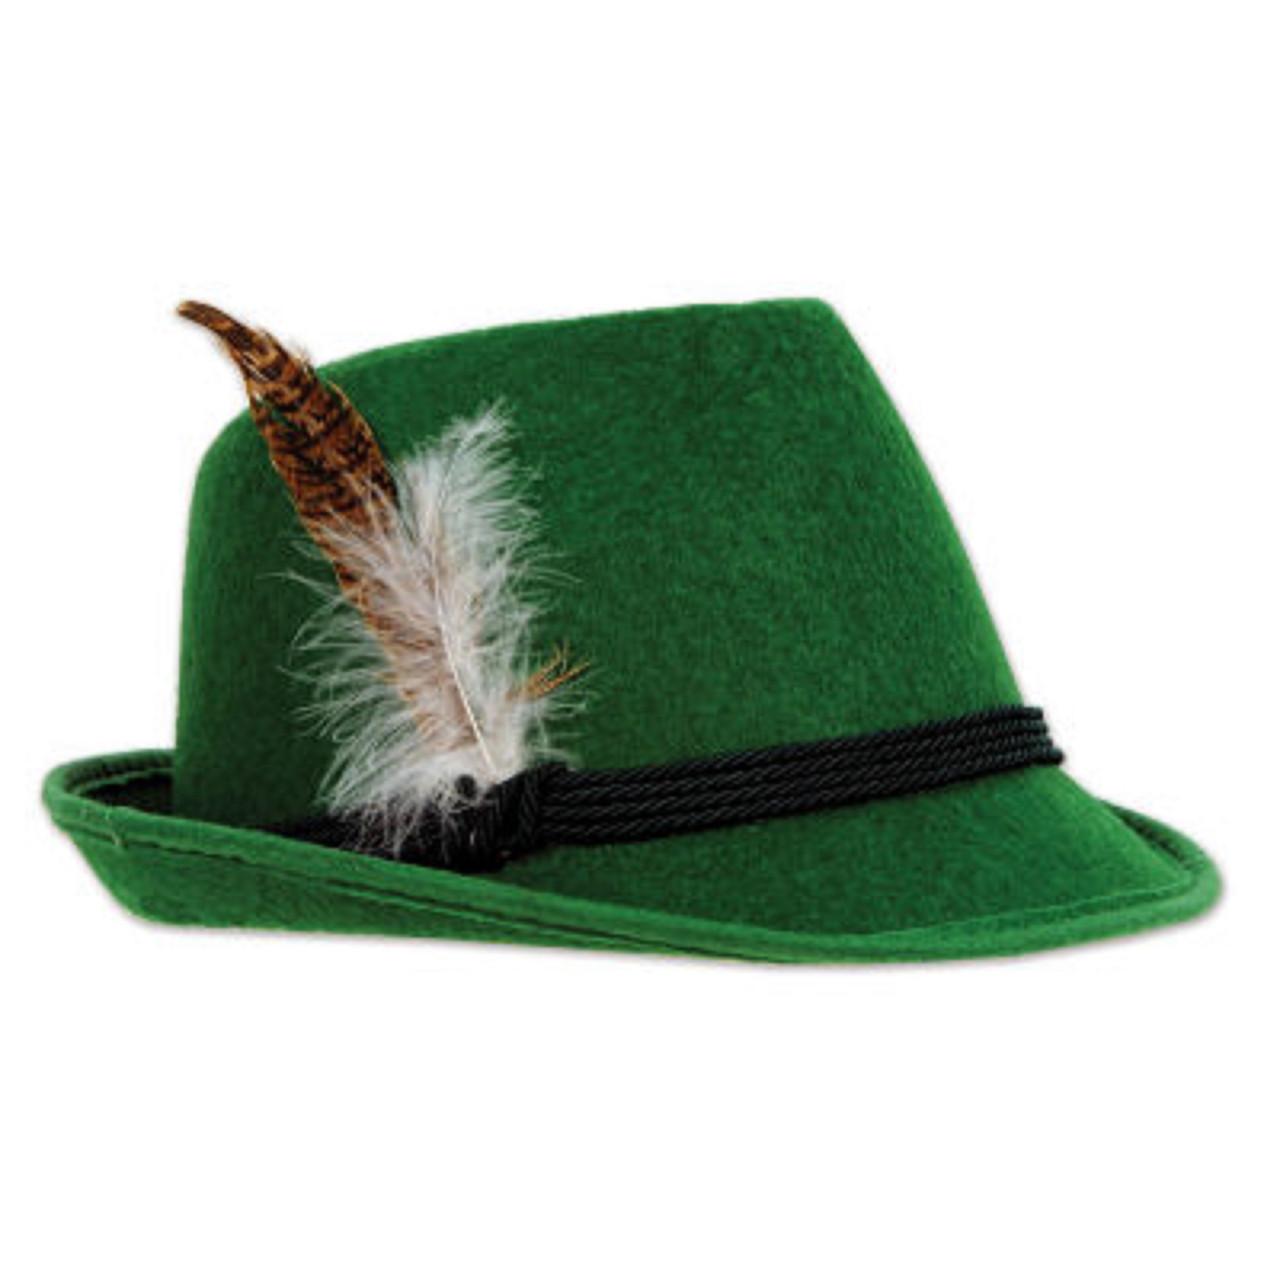 fa8aaee7 Pack of 6 Green Felt Oktoberfest Alpine Hats Costume Accessories ...